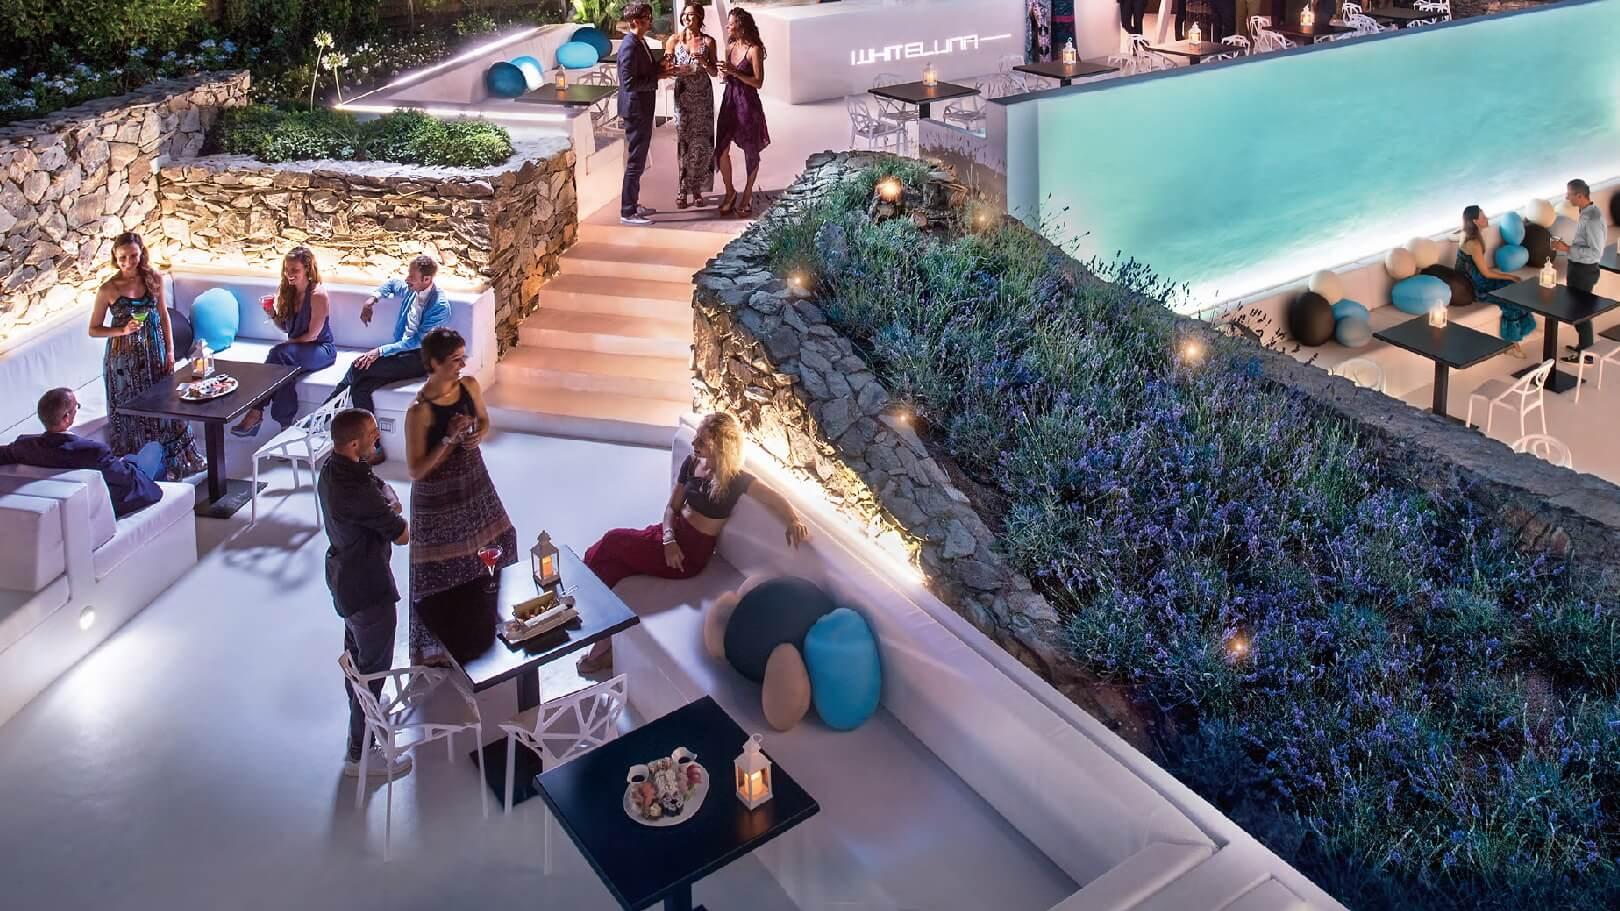 https://www.chialagunaresort.com/wp-content/uploads/2021/05/IHC_Chia-Laguna-Resort_grid_CL4U_aperitif.jpg